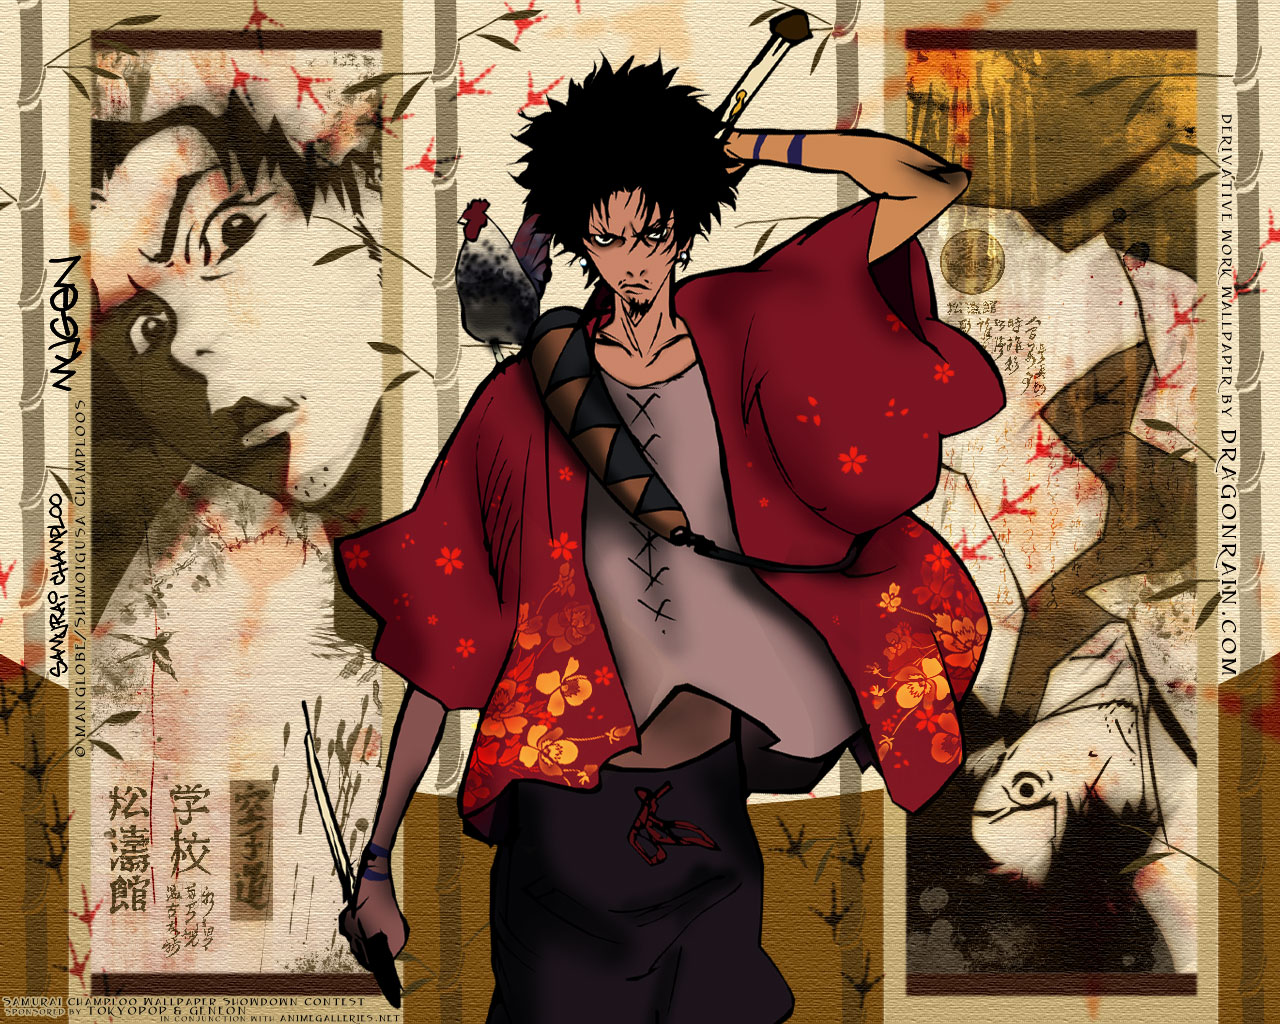 Samurai Champloo Anime Wallpaper # 46